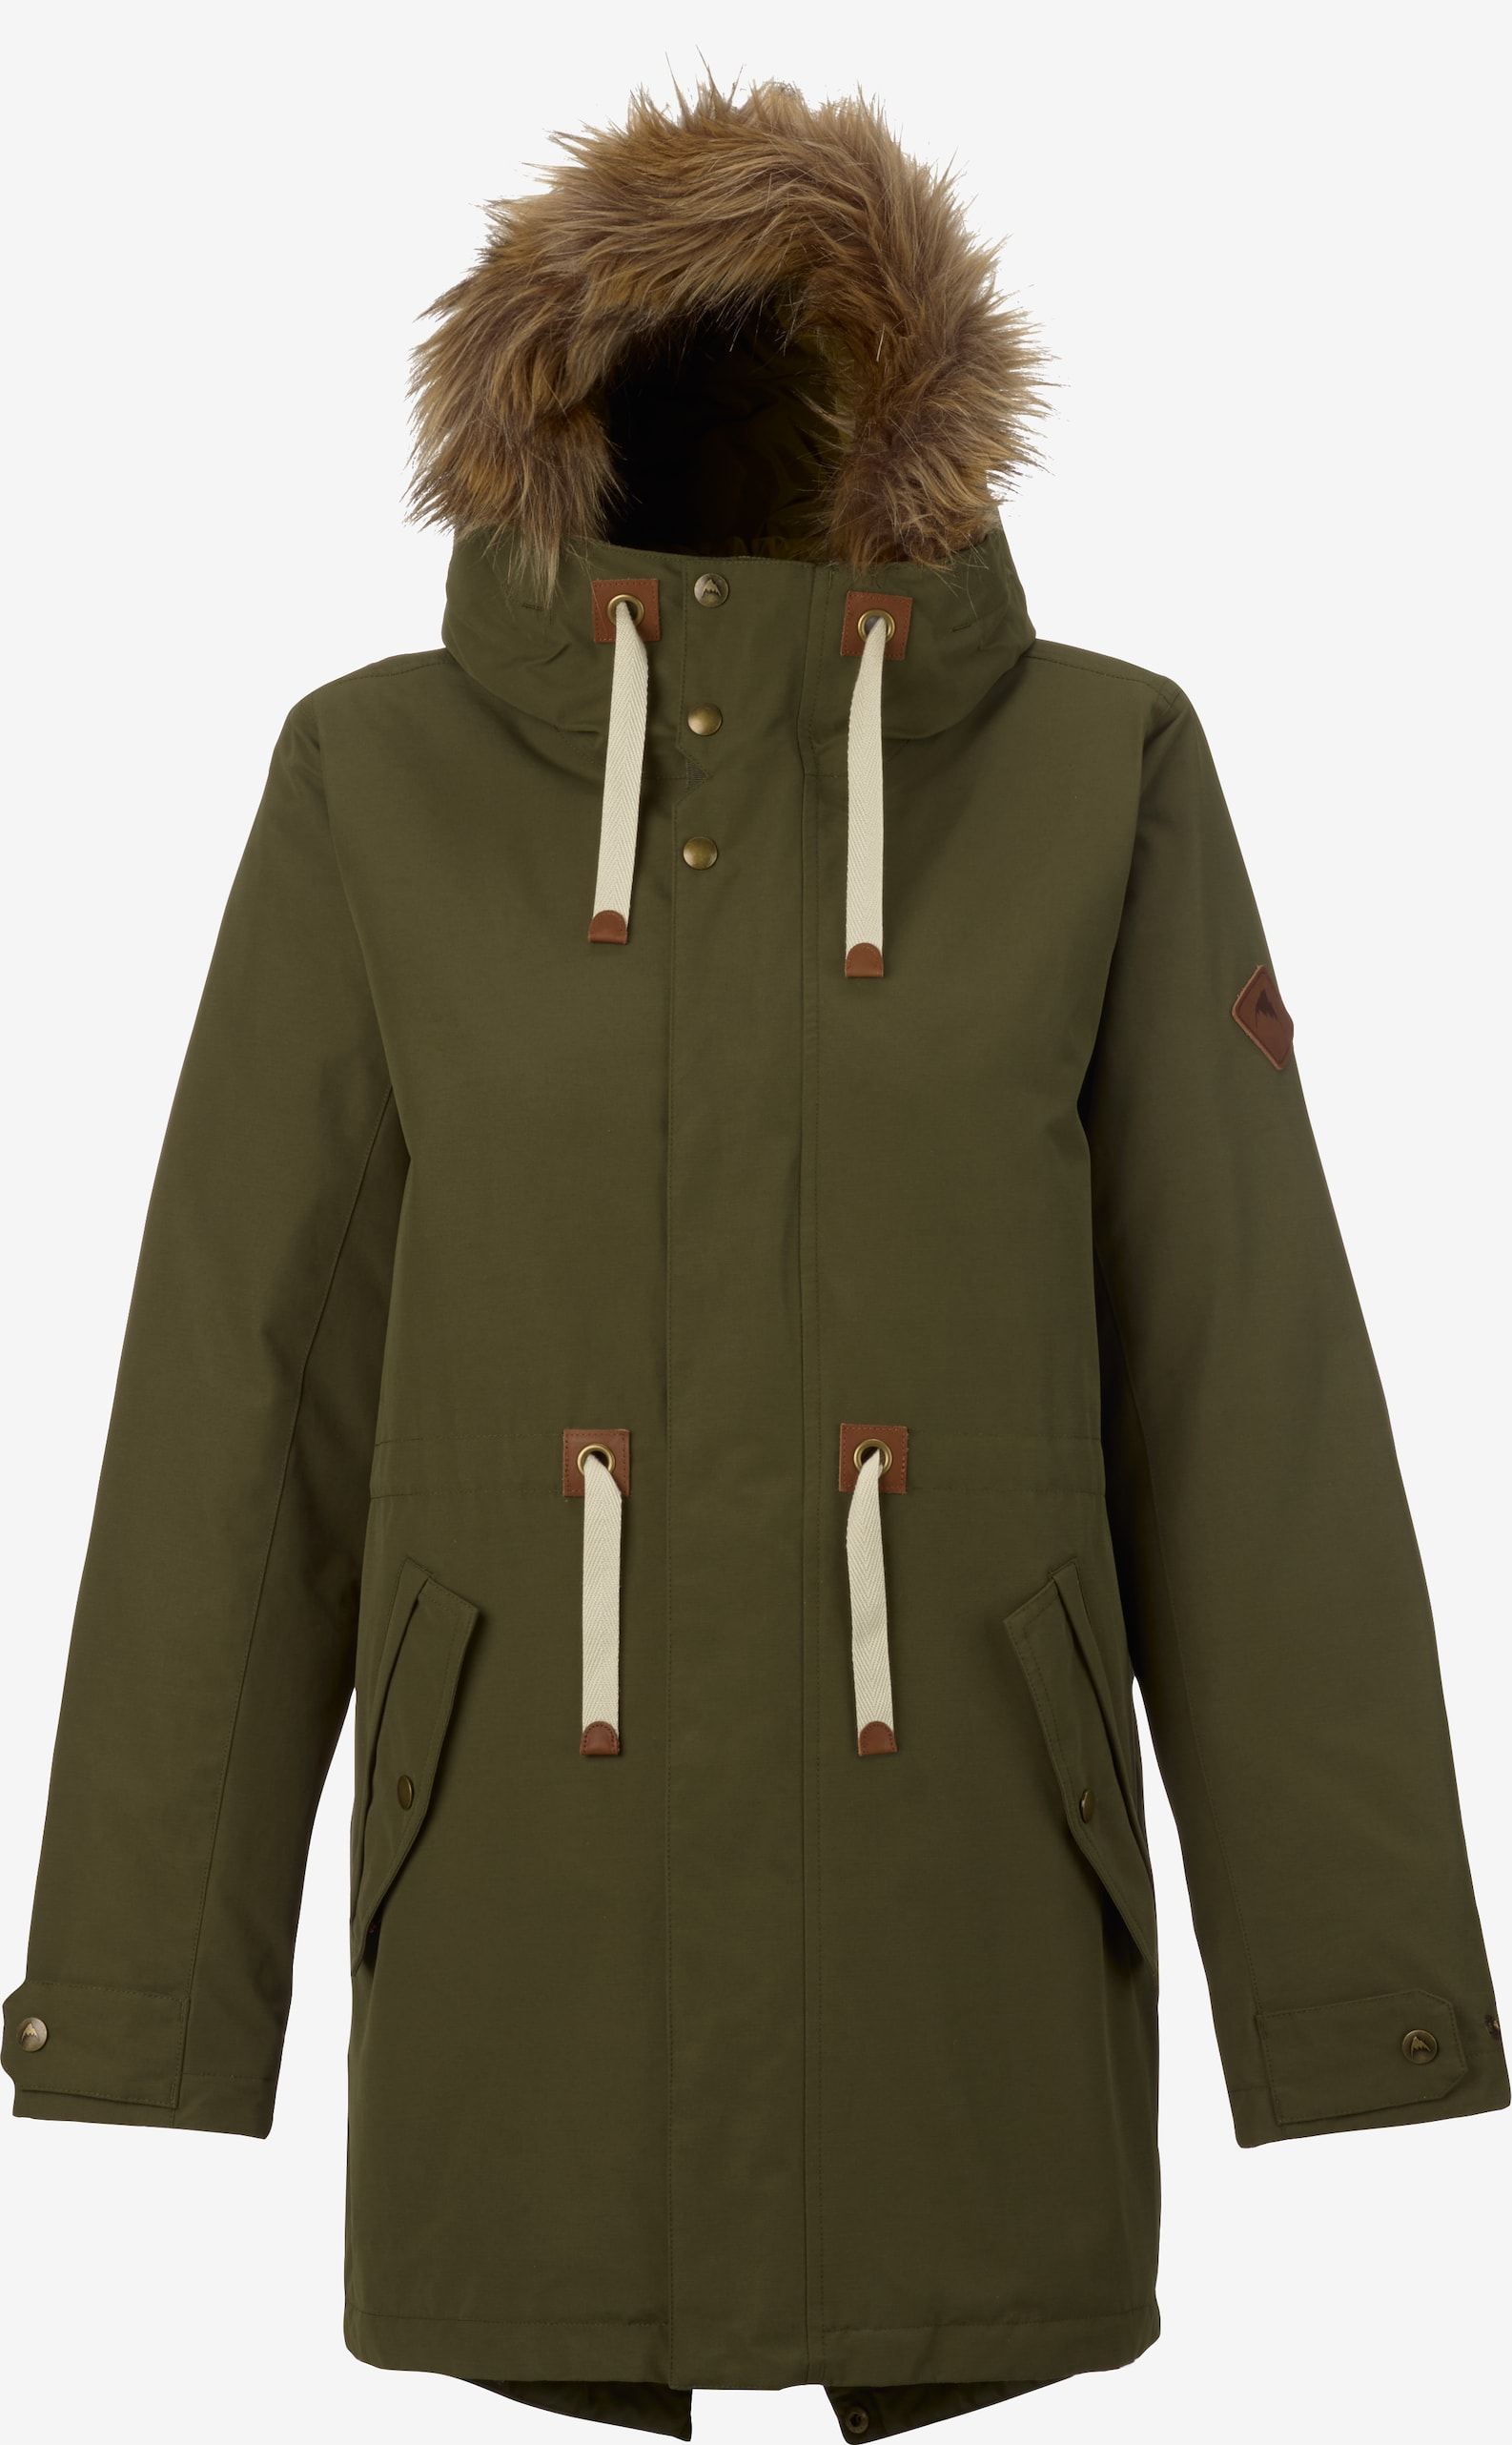 Burton Saxton Parka Jacket shown in Keef